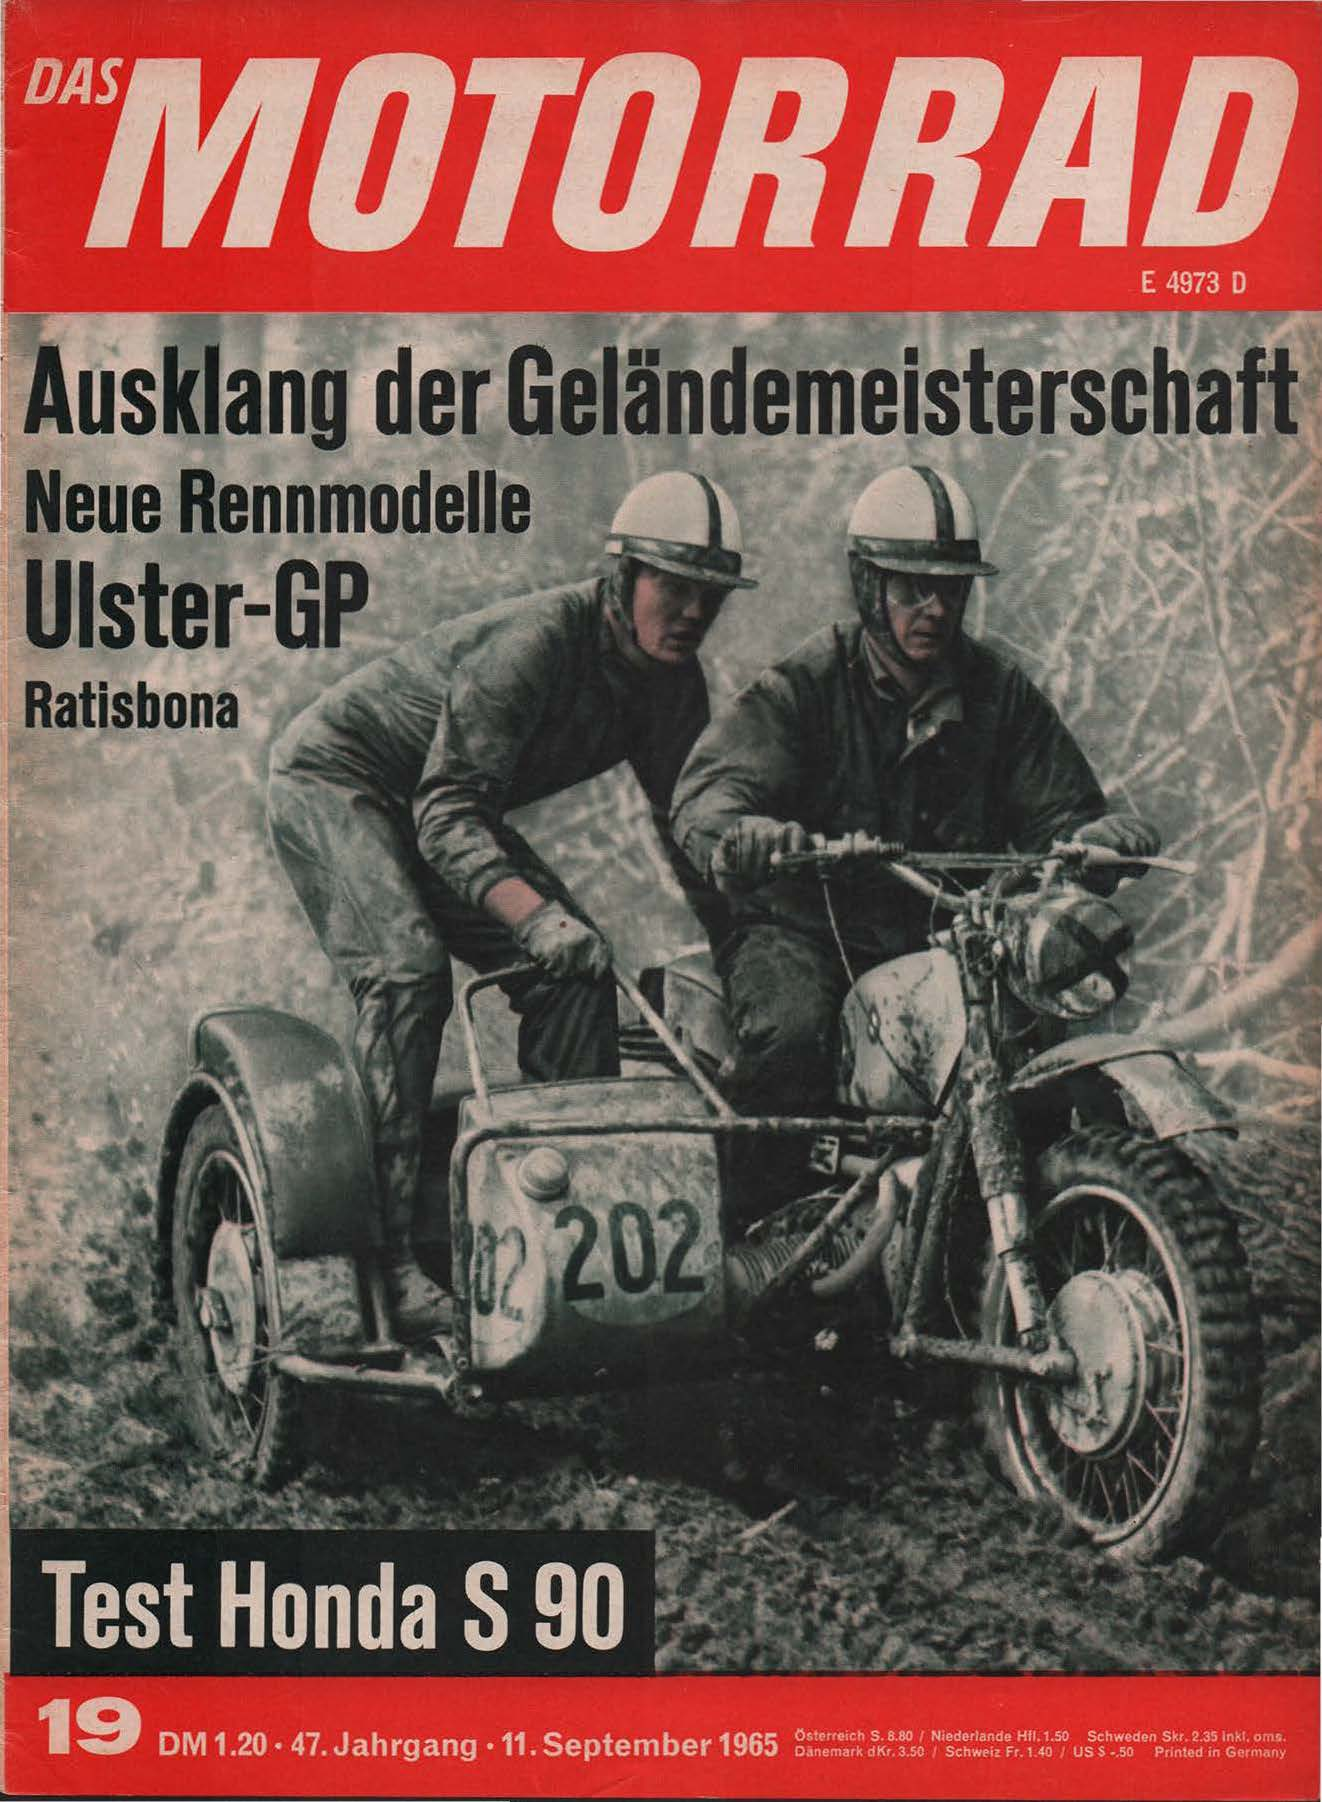 Das Motorrad, 11 September 1965, E4973D